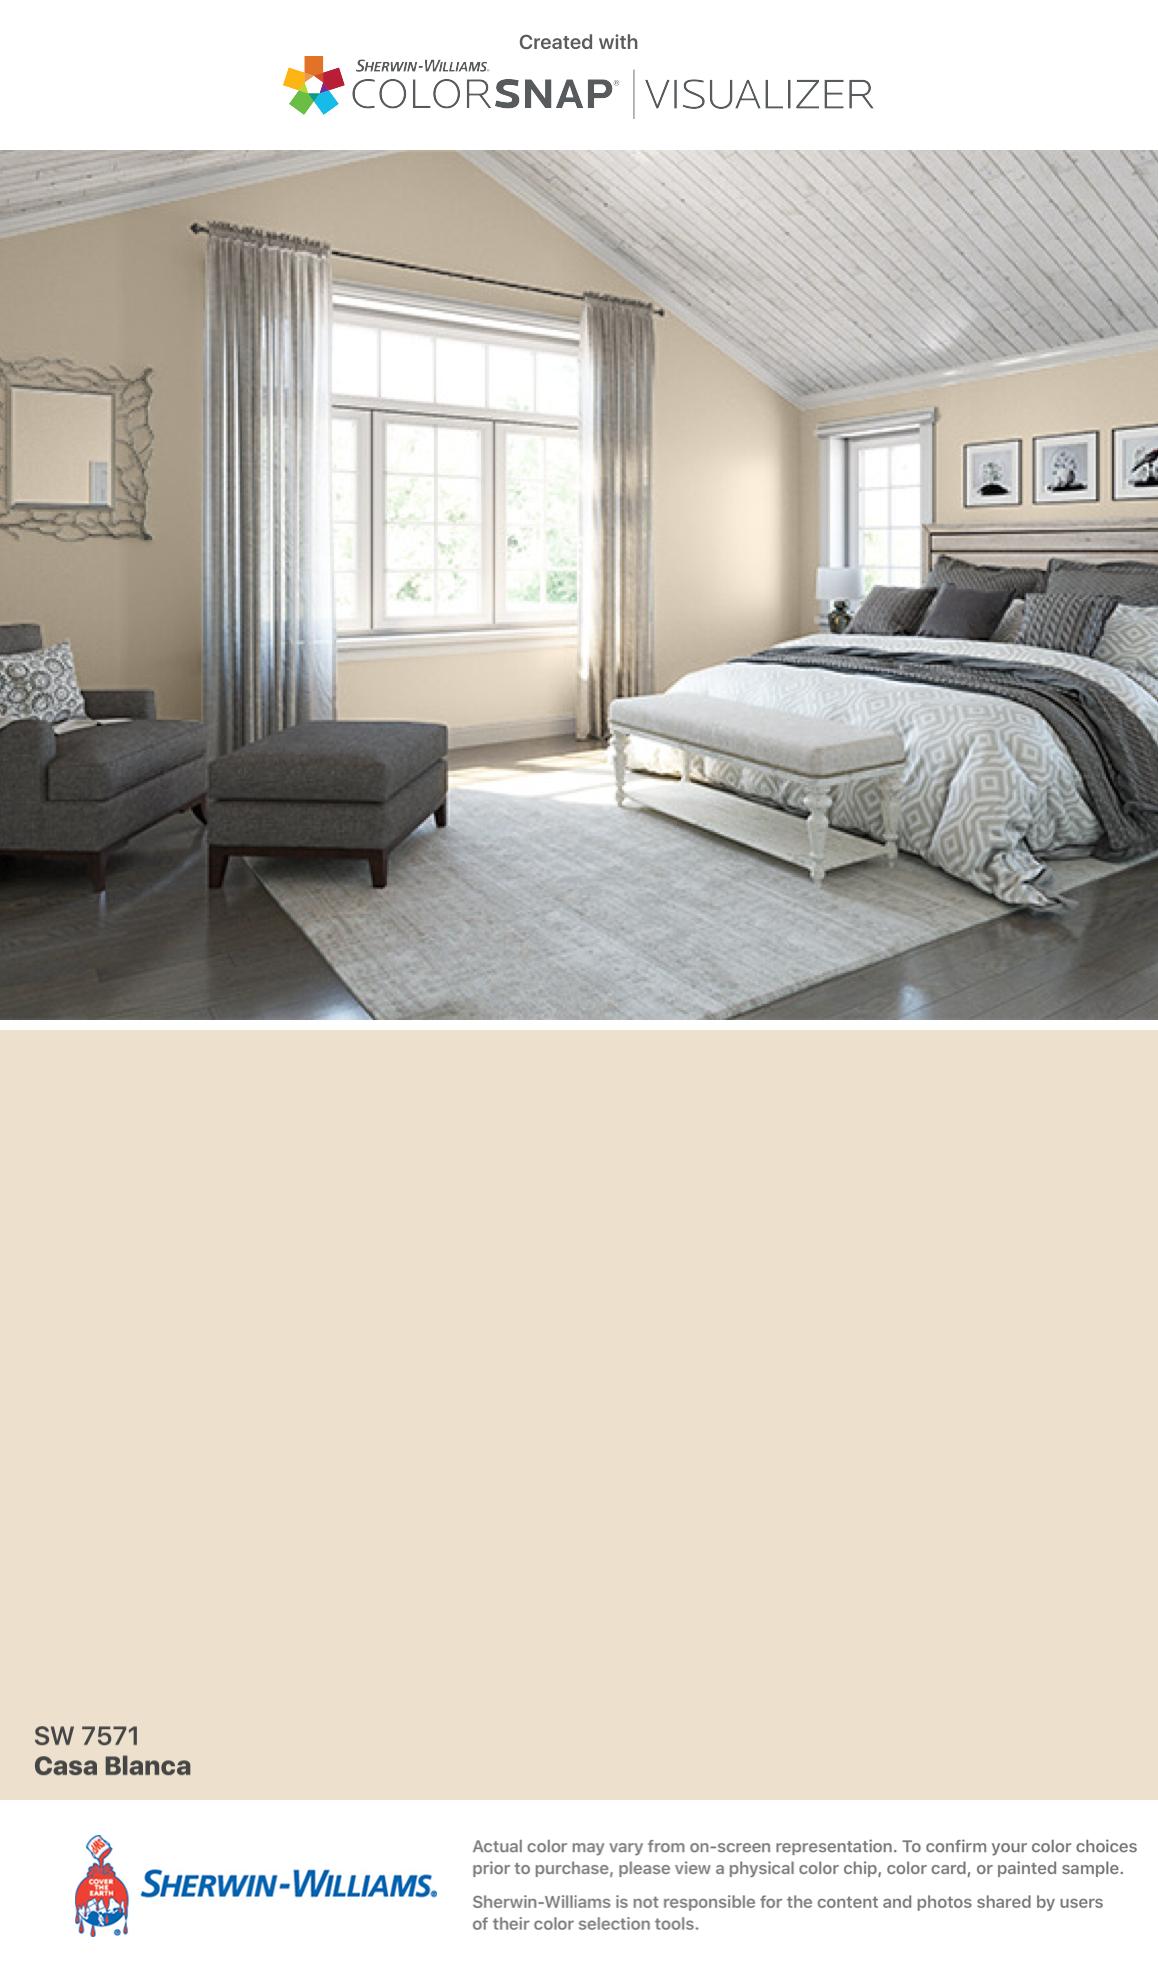 Casa Blanca SW 7571 - White & Pastel Paint Color - Sherwin-Williams